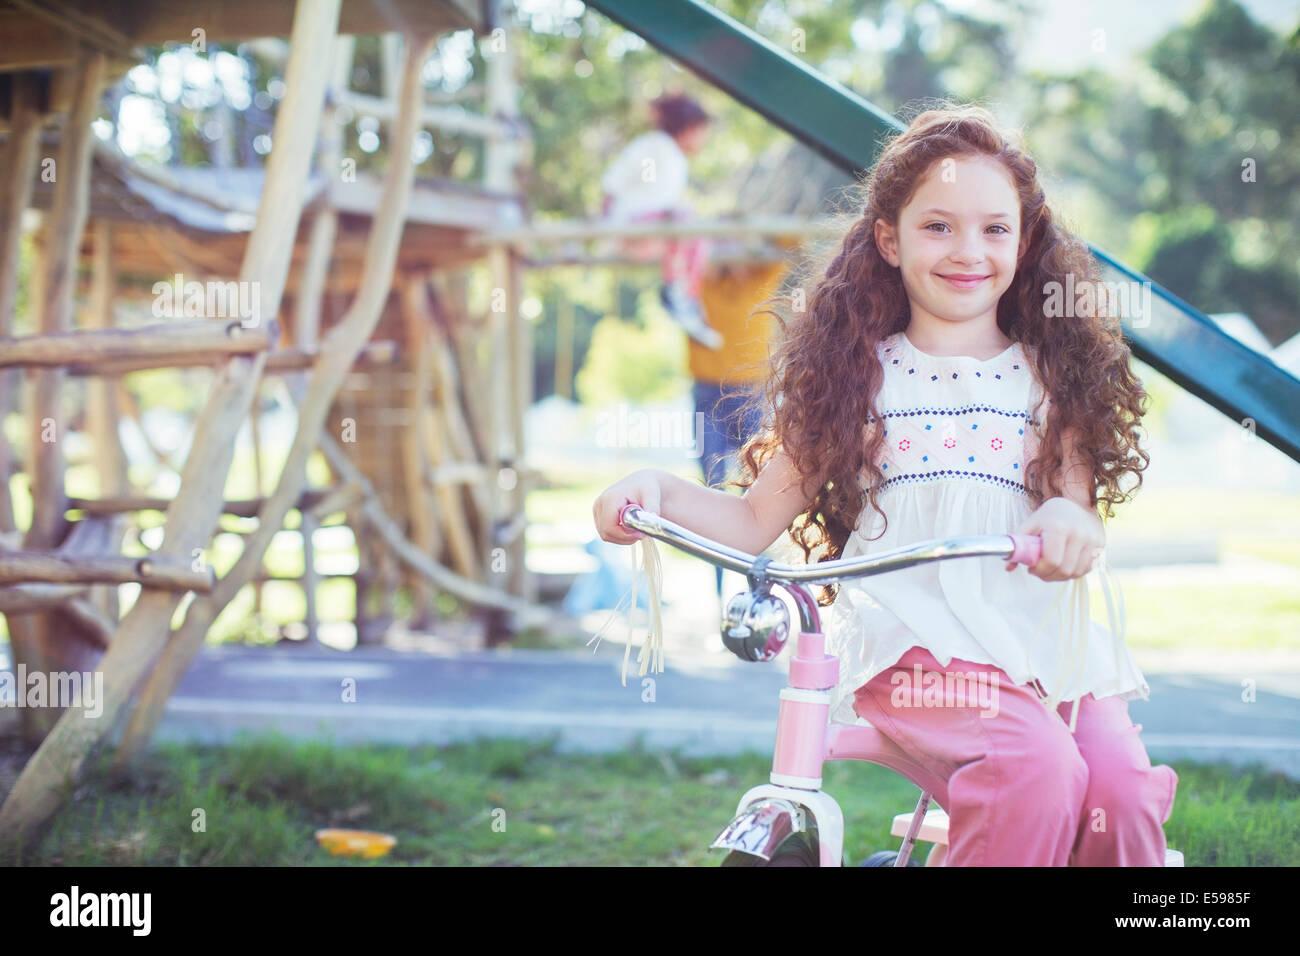 Chica sonriente sentado en bicicleta en playground Imagen De Stock